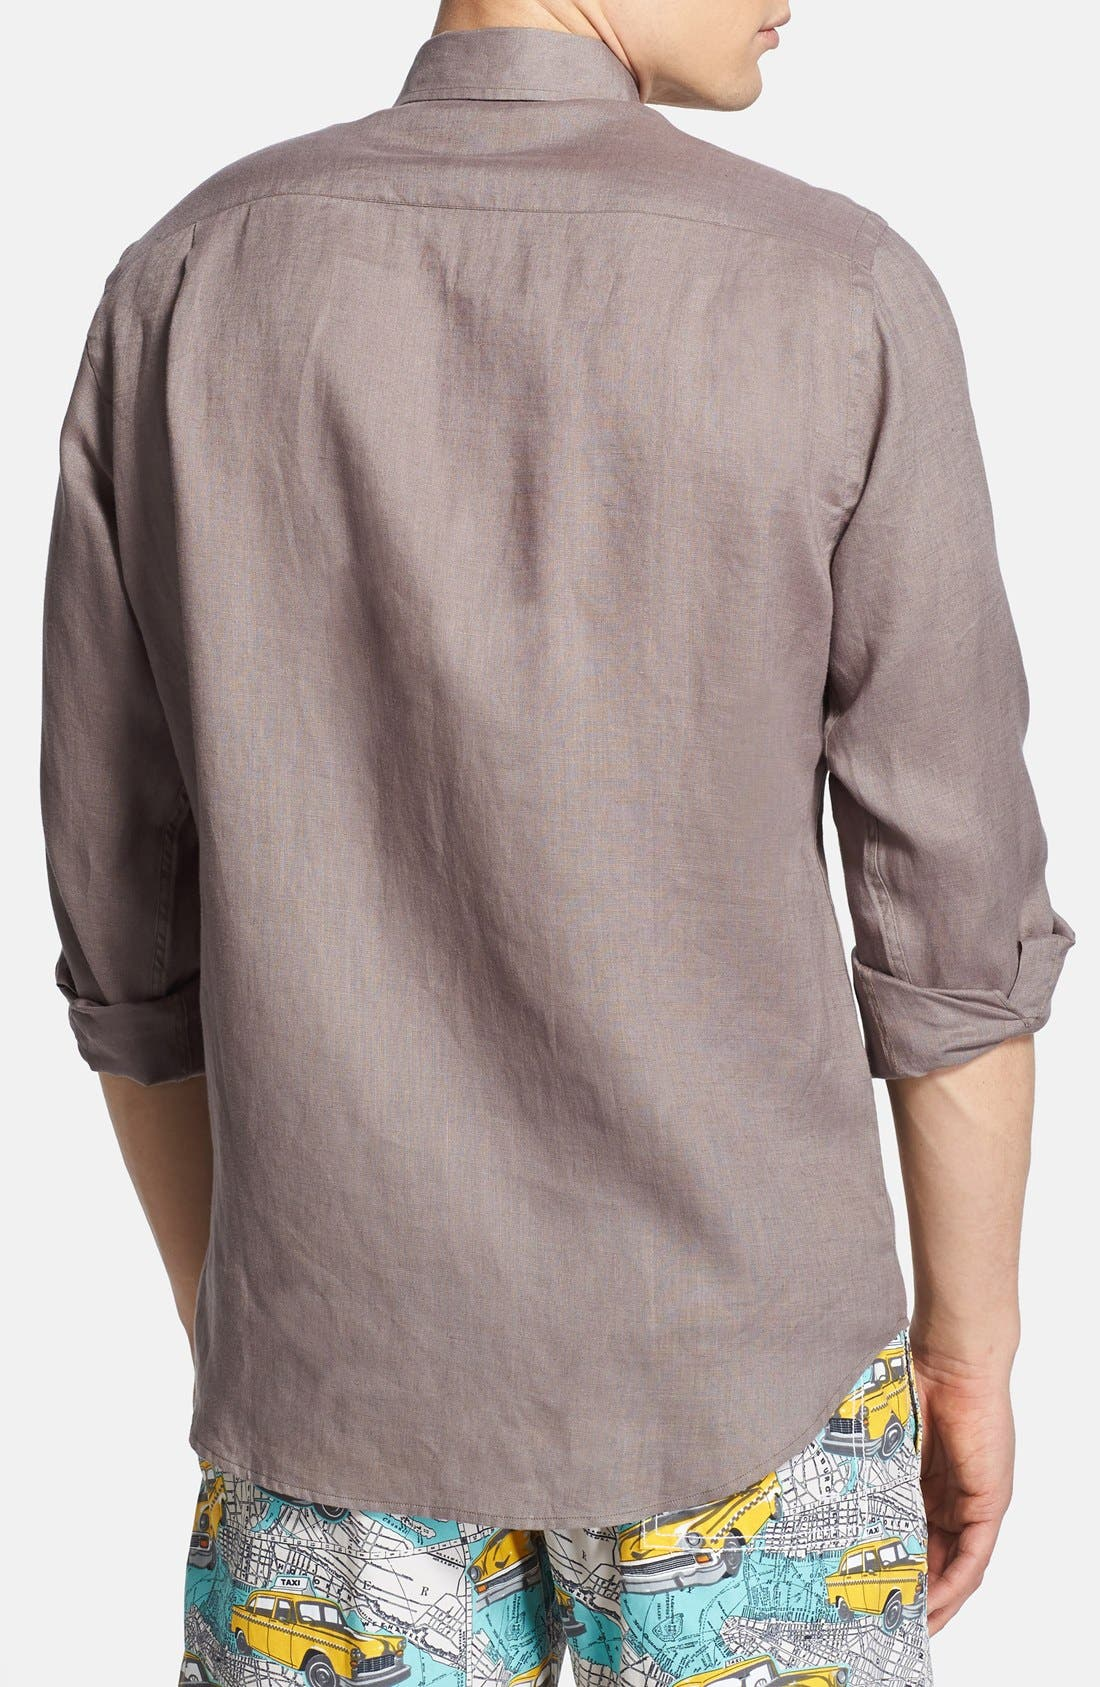 'Caroubier' Linen Shirt,                             Alternate thumbnail 19, color,